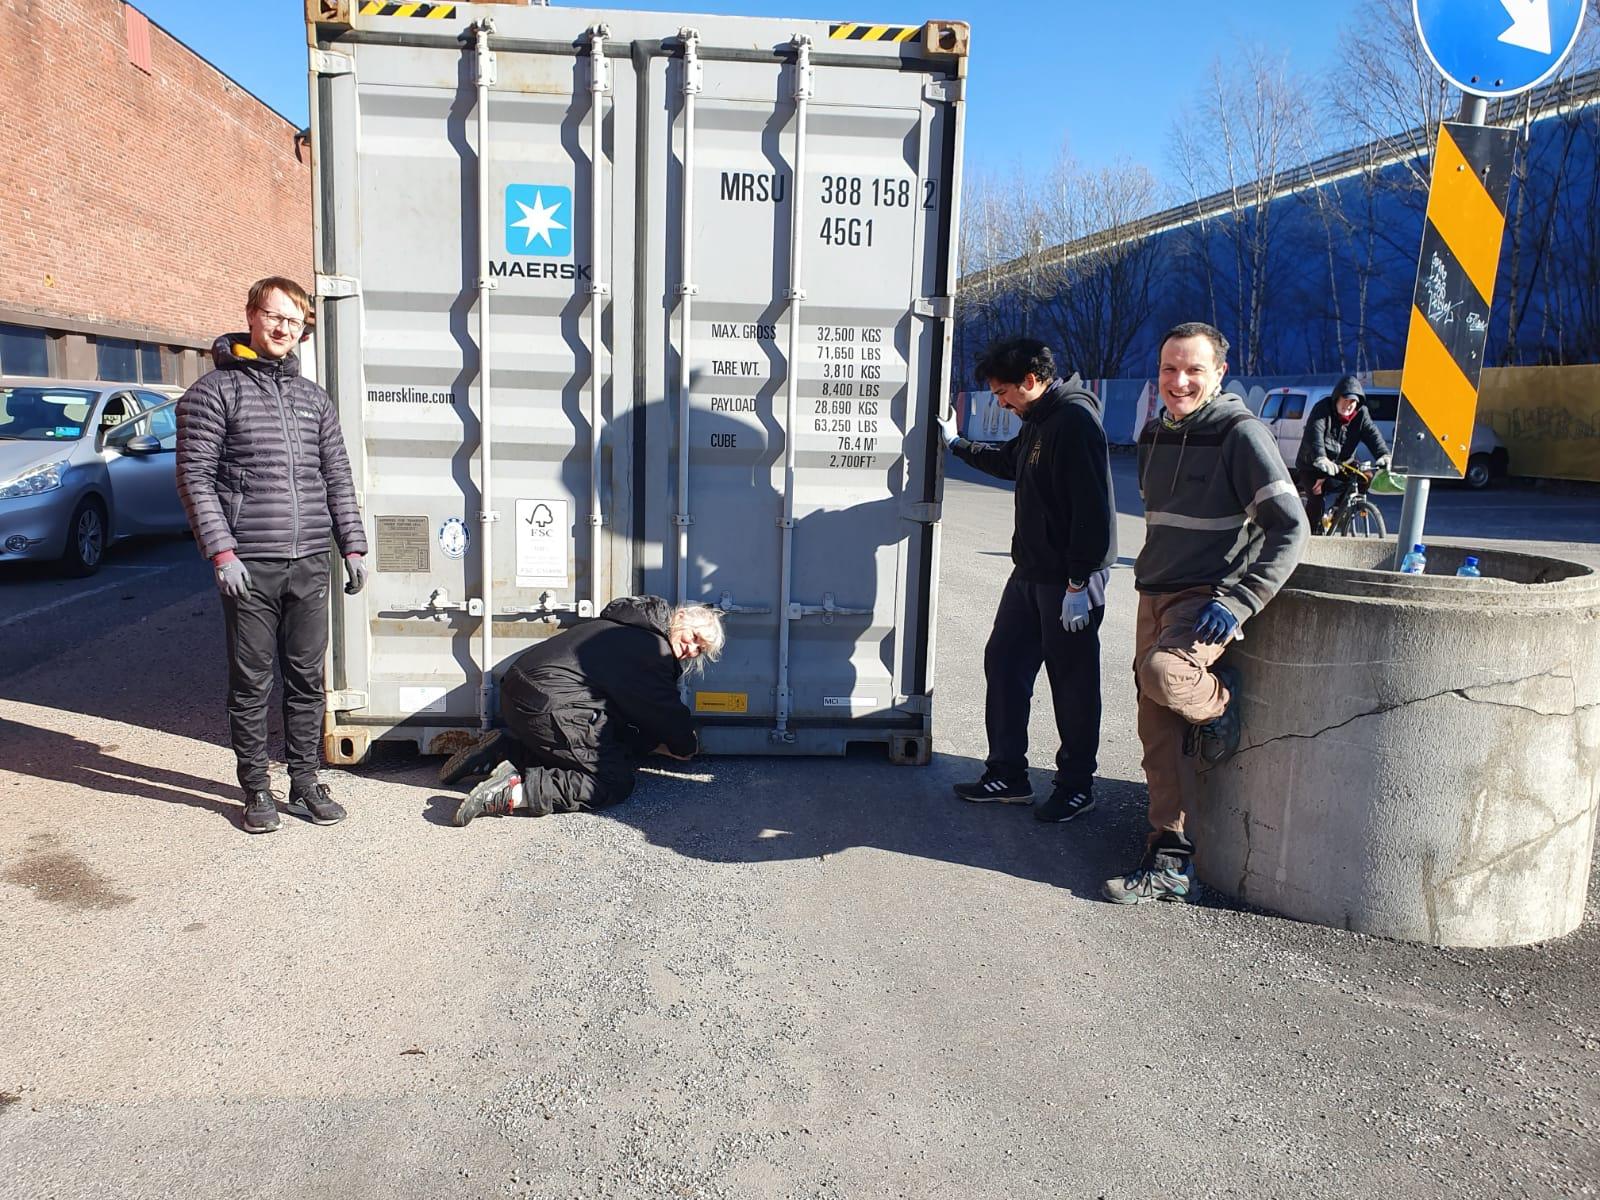 Container 130 forsegles